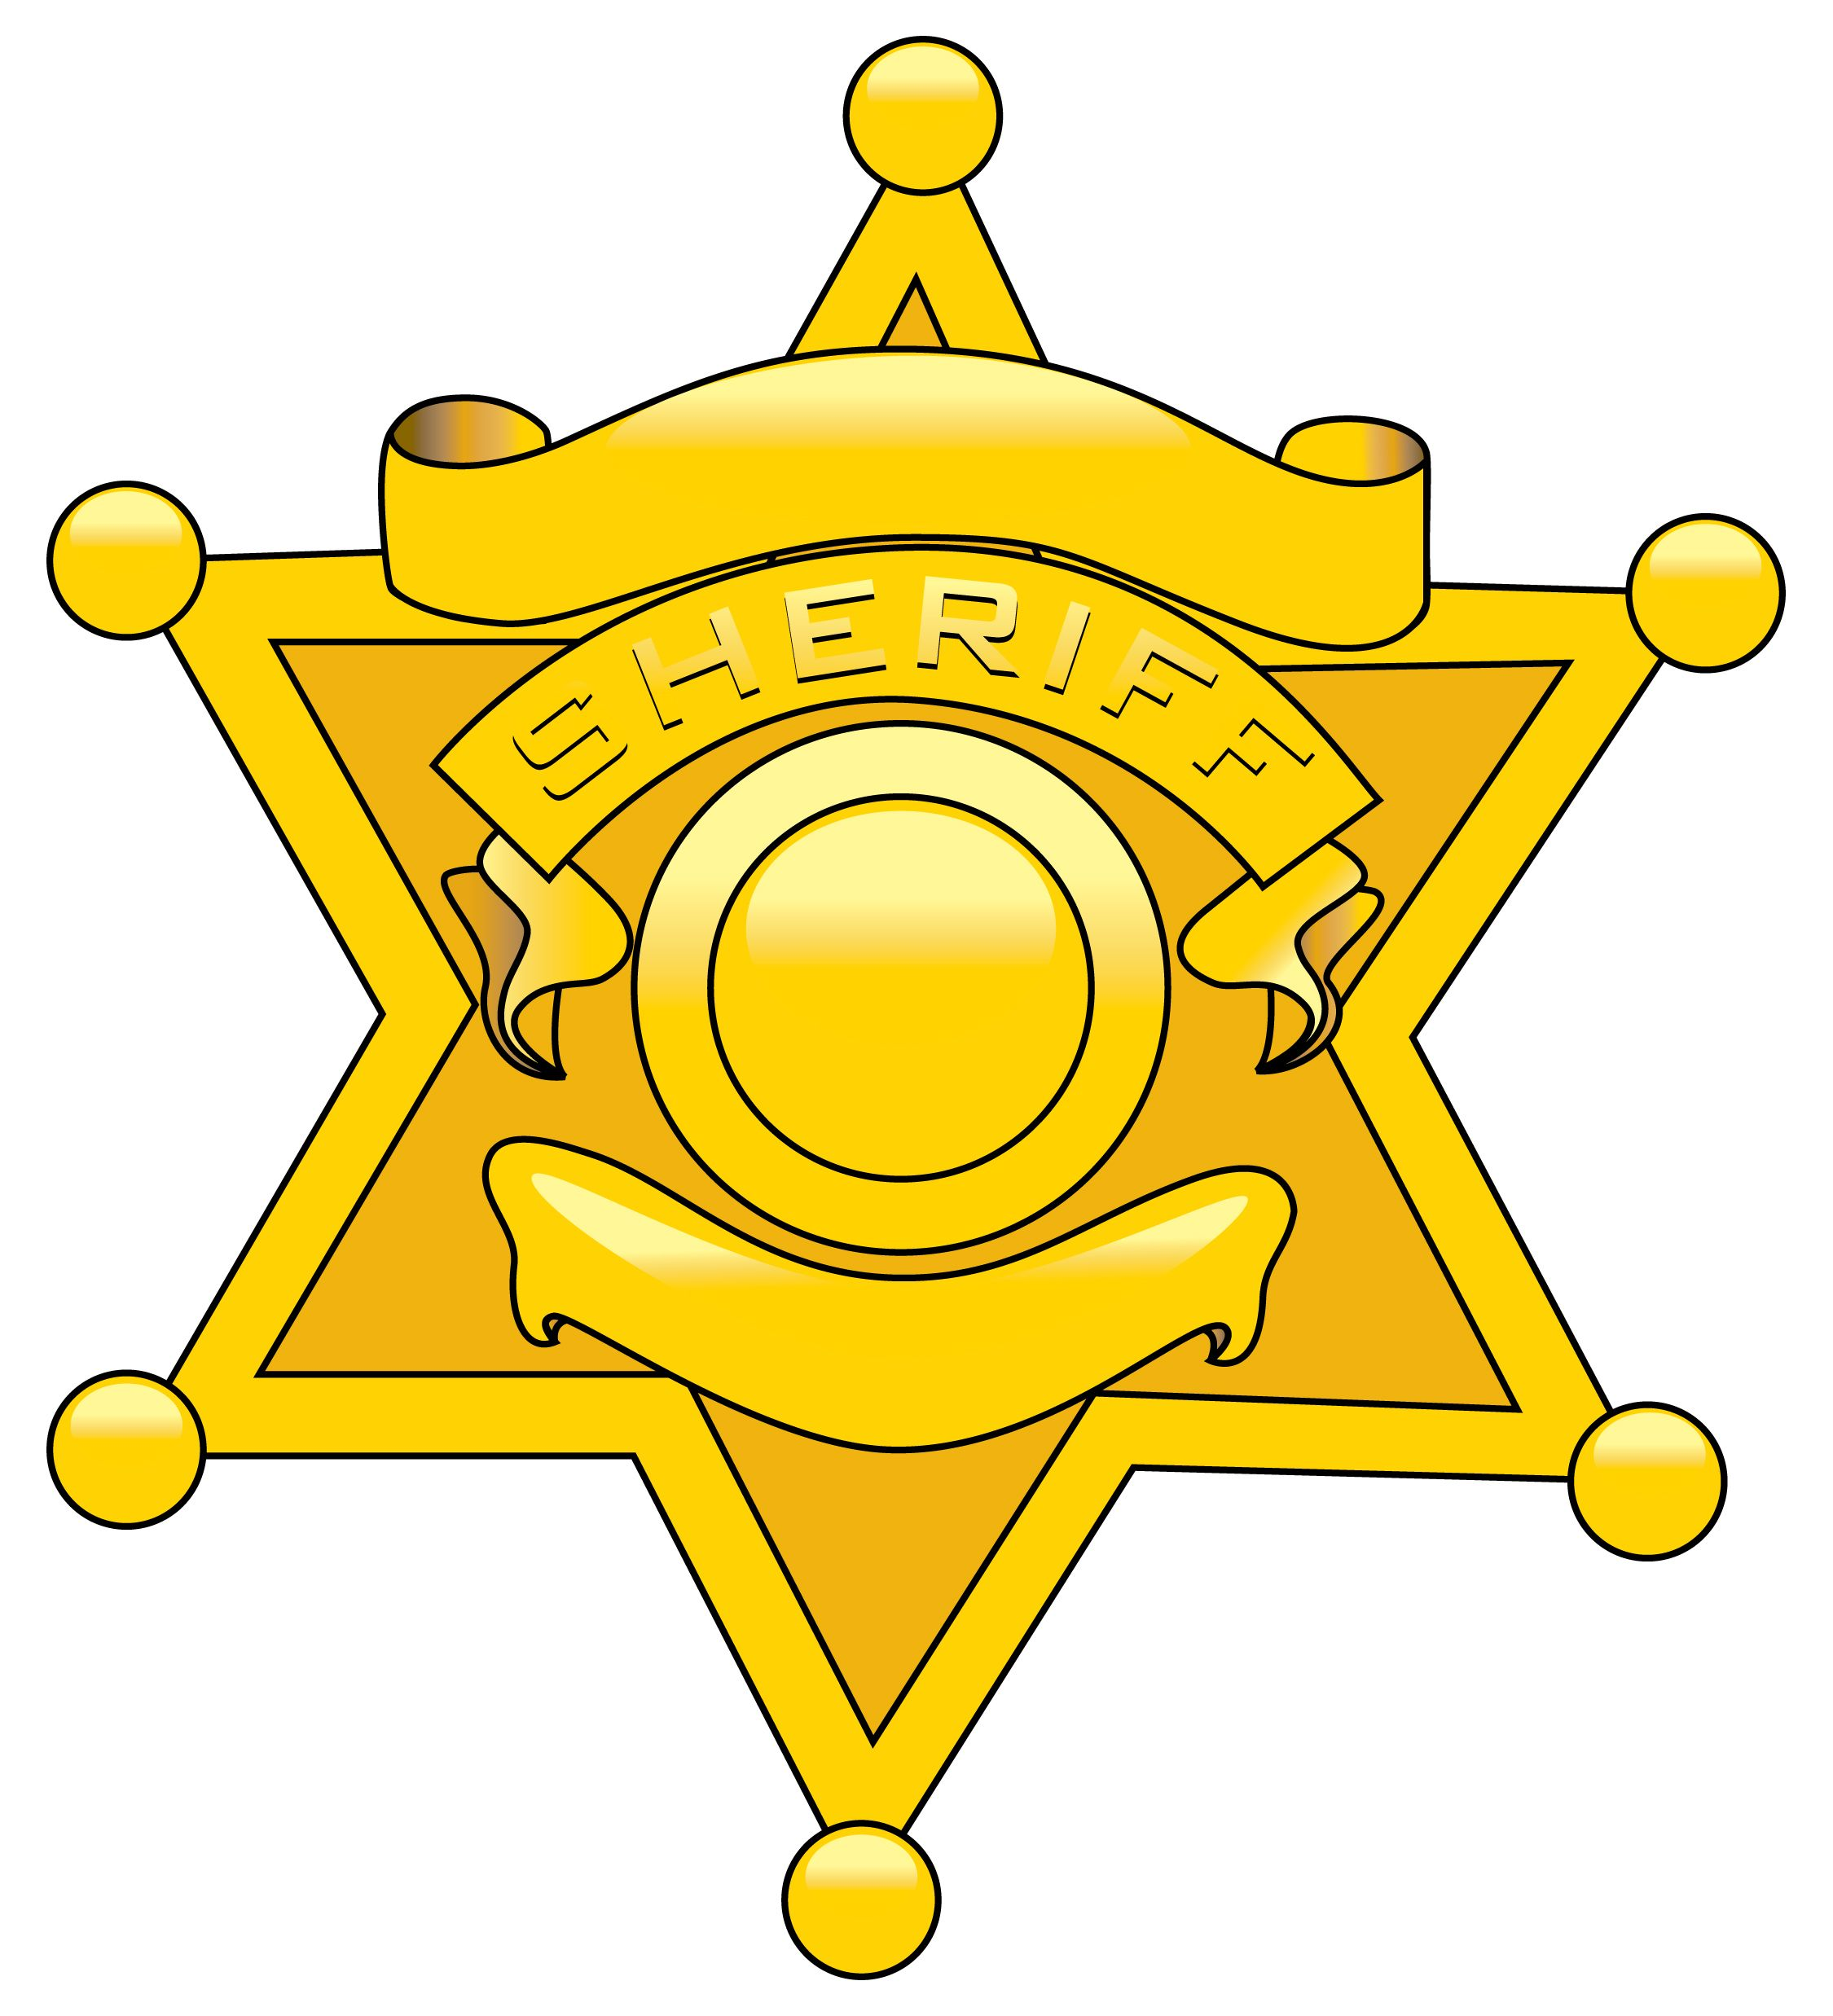 Sheriff Badge Gallery For Police Cartoon Badge Clipart Image 21068 Sheriff Badge Clip Art Badge